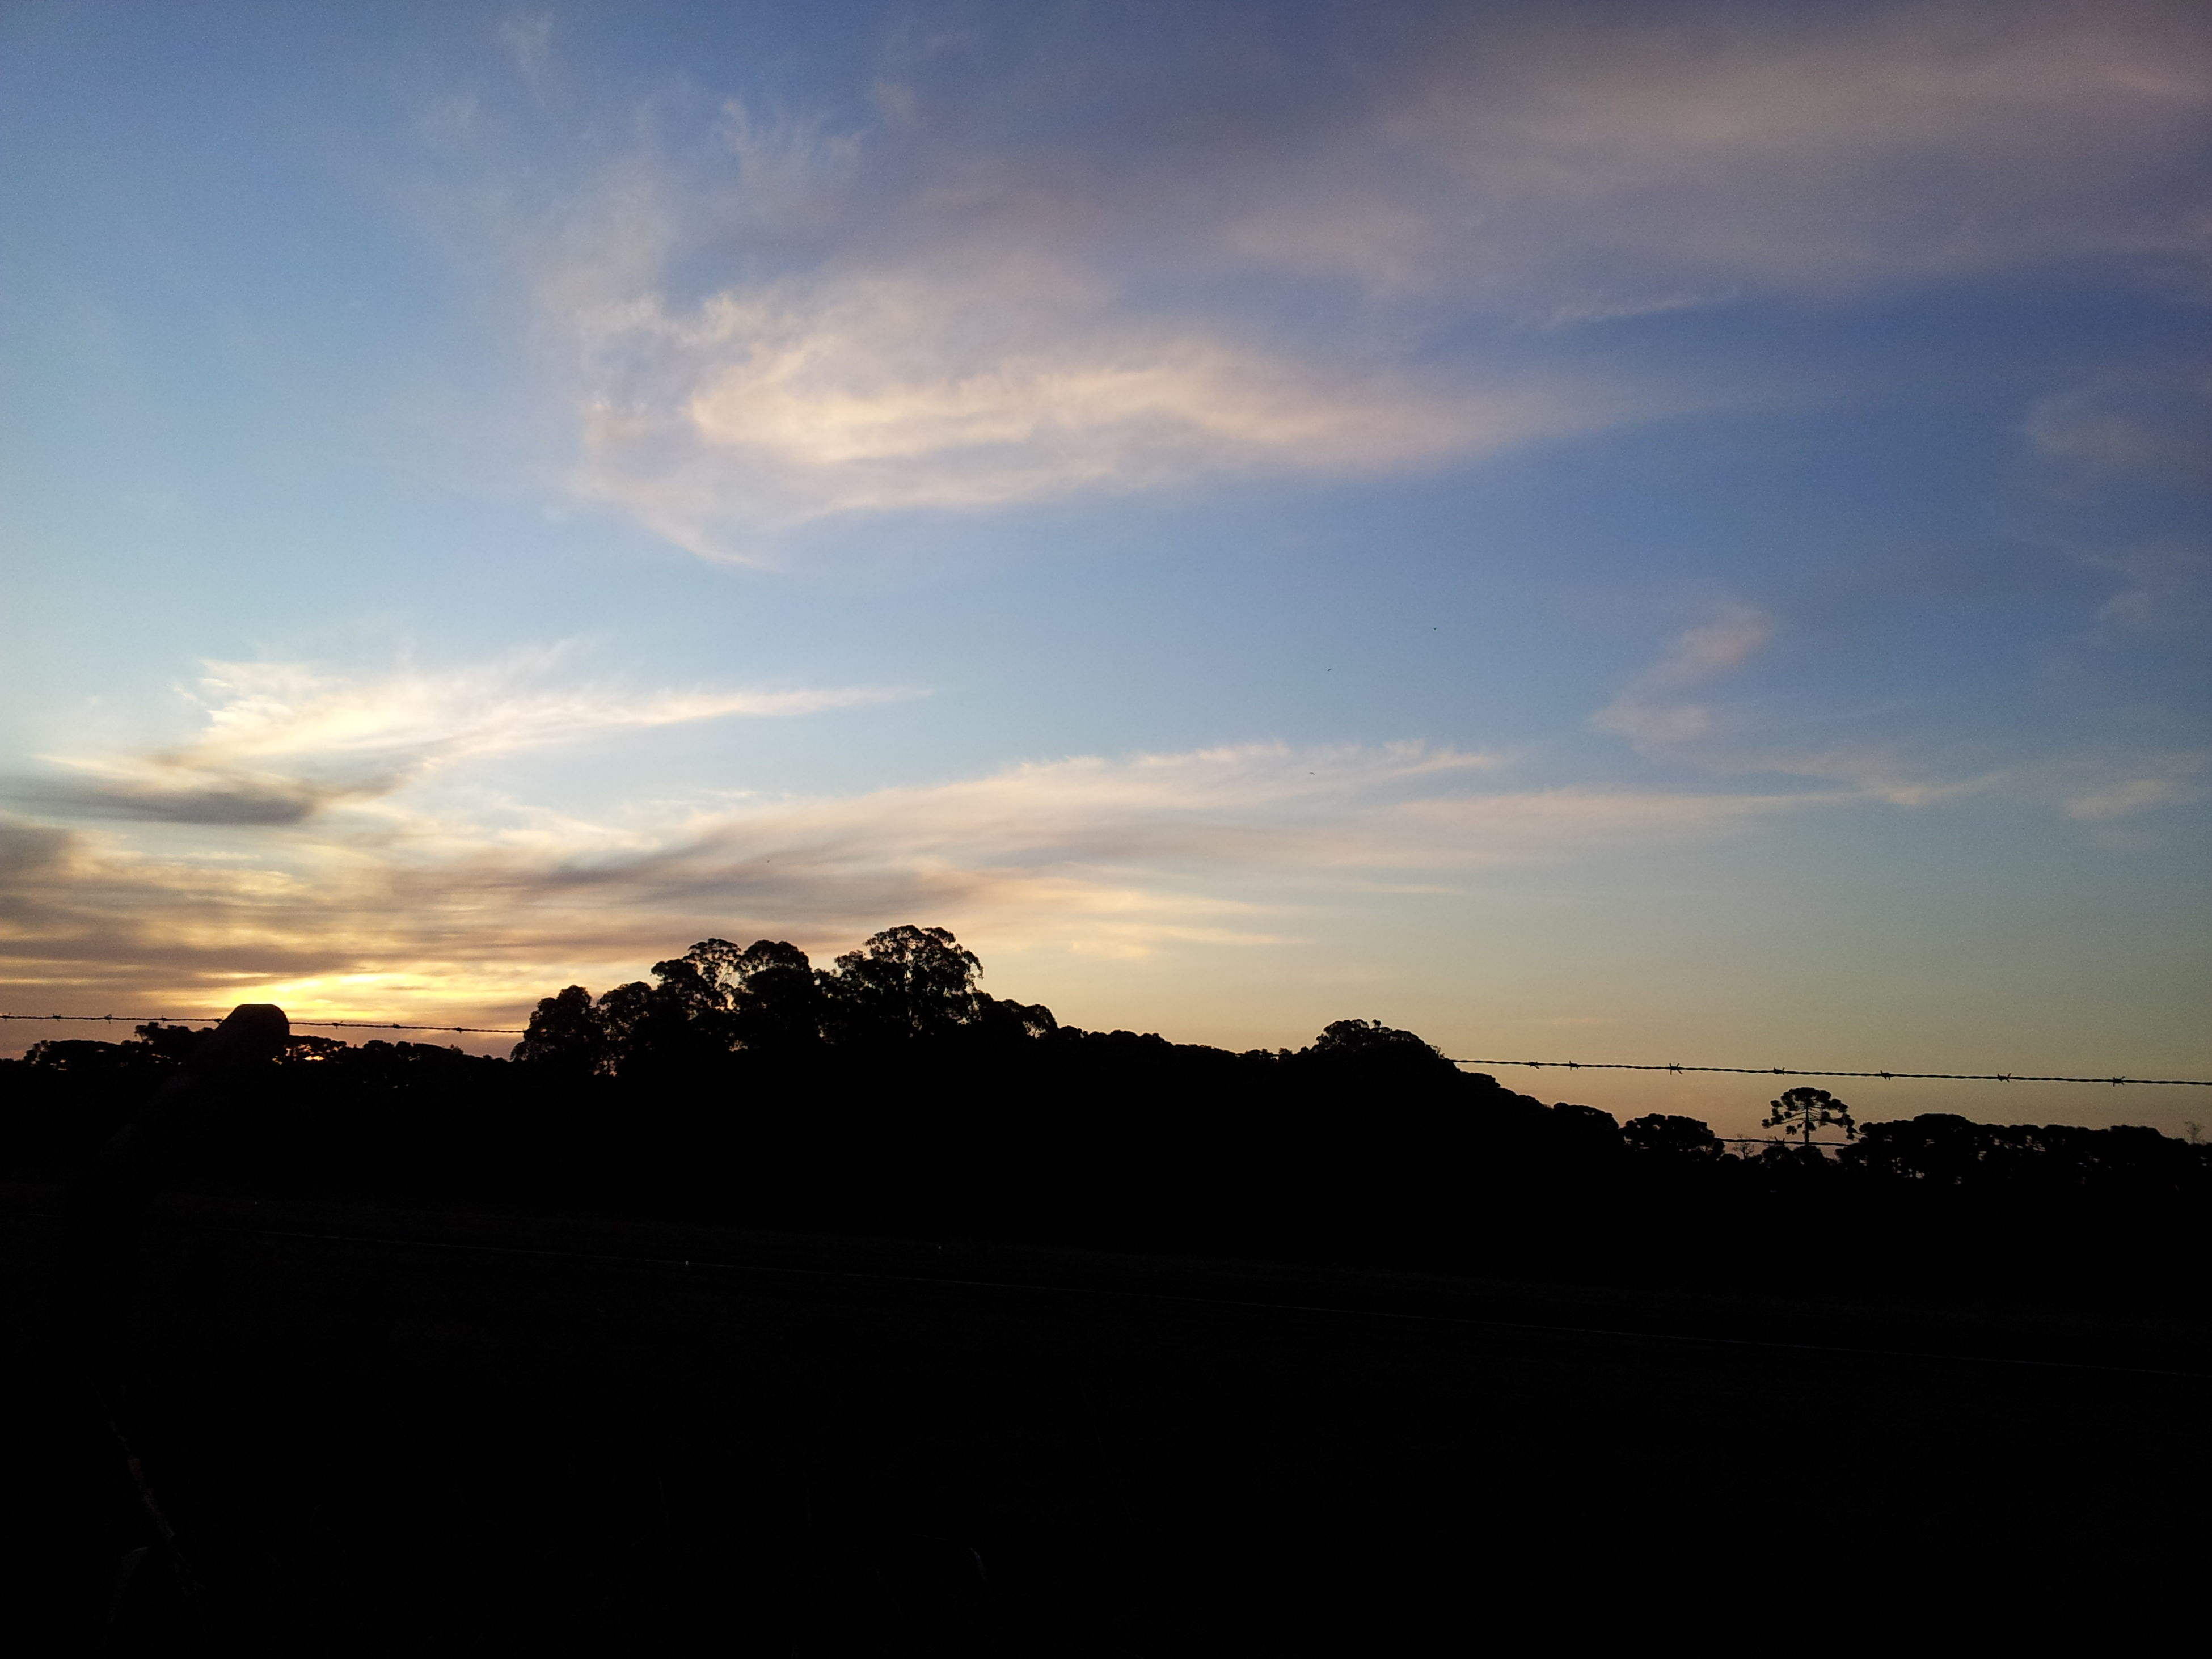 silhouette, sunset, sky, tranquil scene, landscape, tranquility, scenics, beauty in nature, tree, nature, cloud - sky, field, cloud, dark, dusk, idyllic, outdoors, outline, copy space, non-urban scene